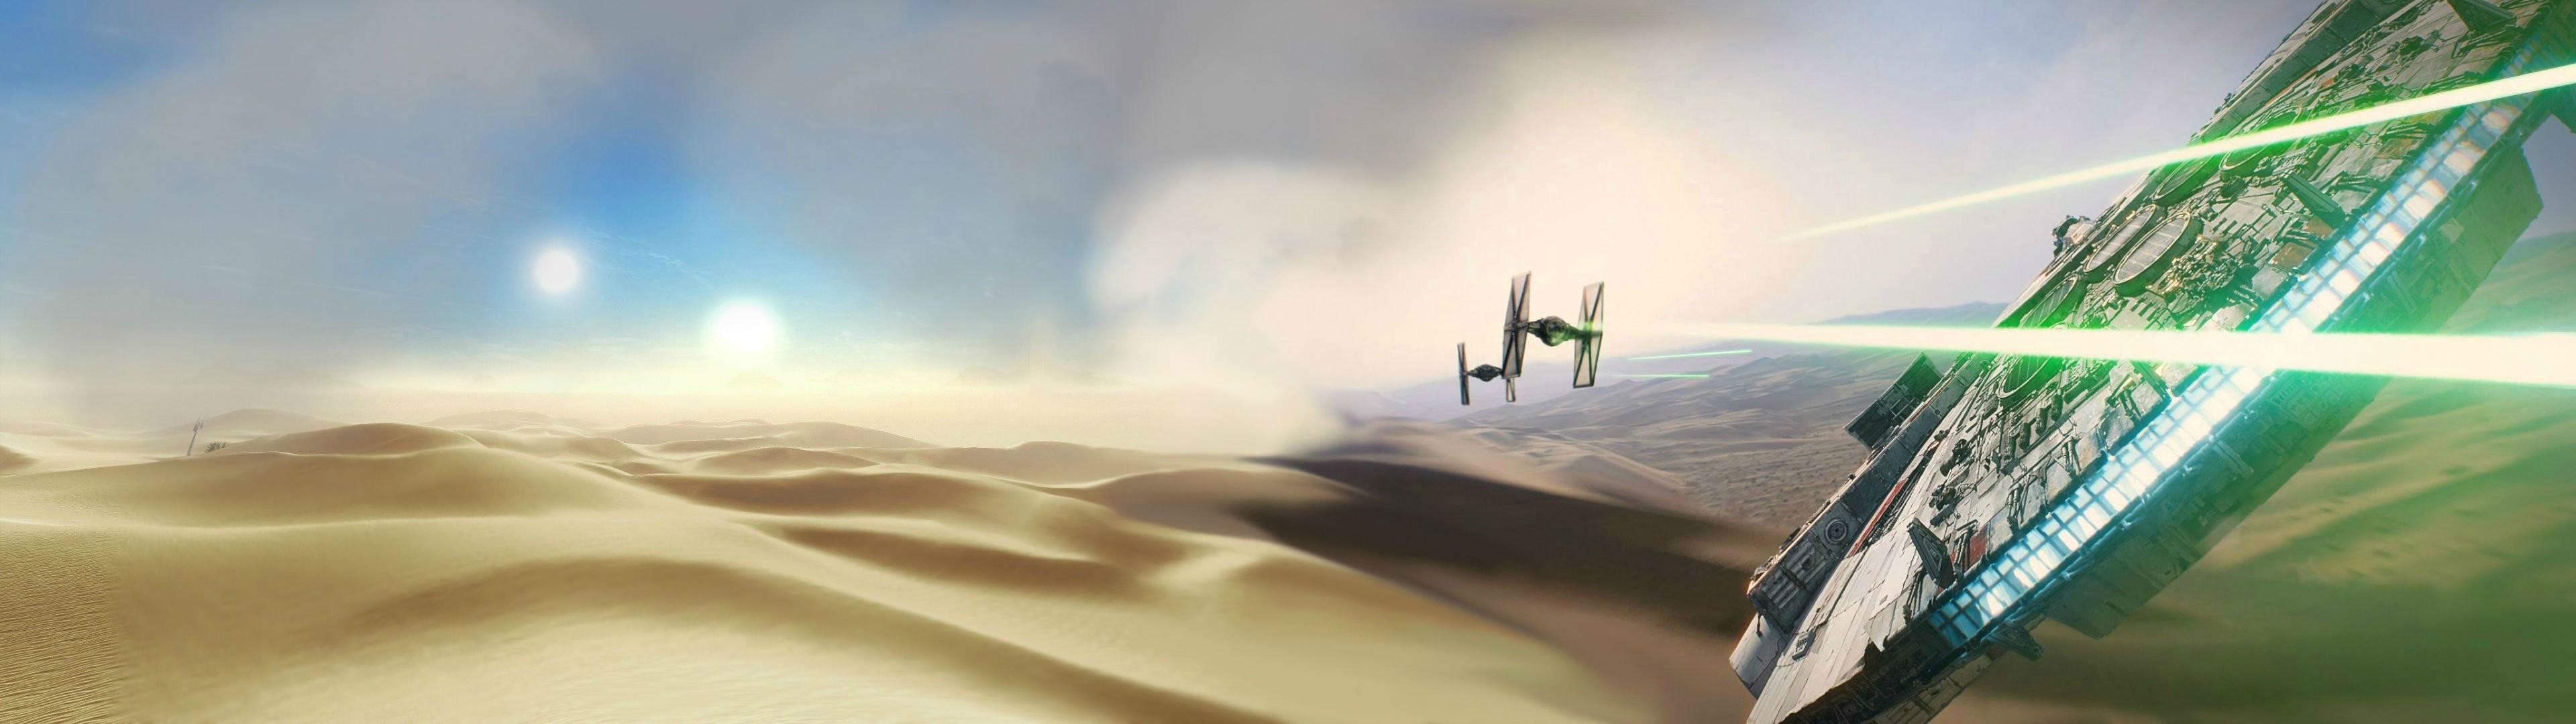 STAR WARS FORCE AWAKENS action adventure sci-fi futuristic 1star-wars .